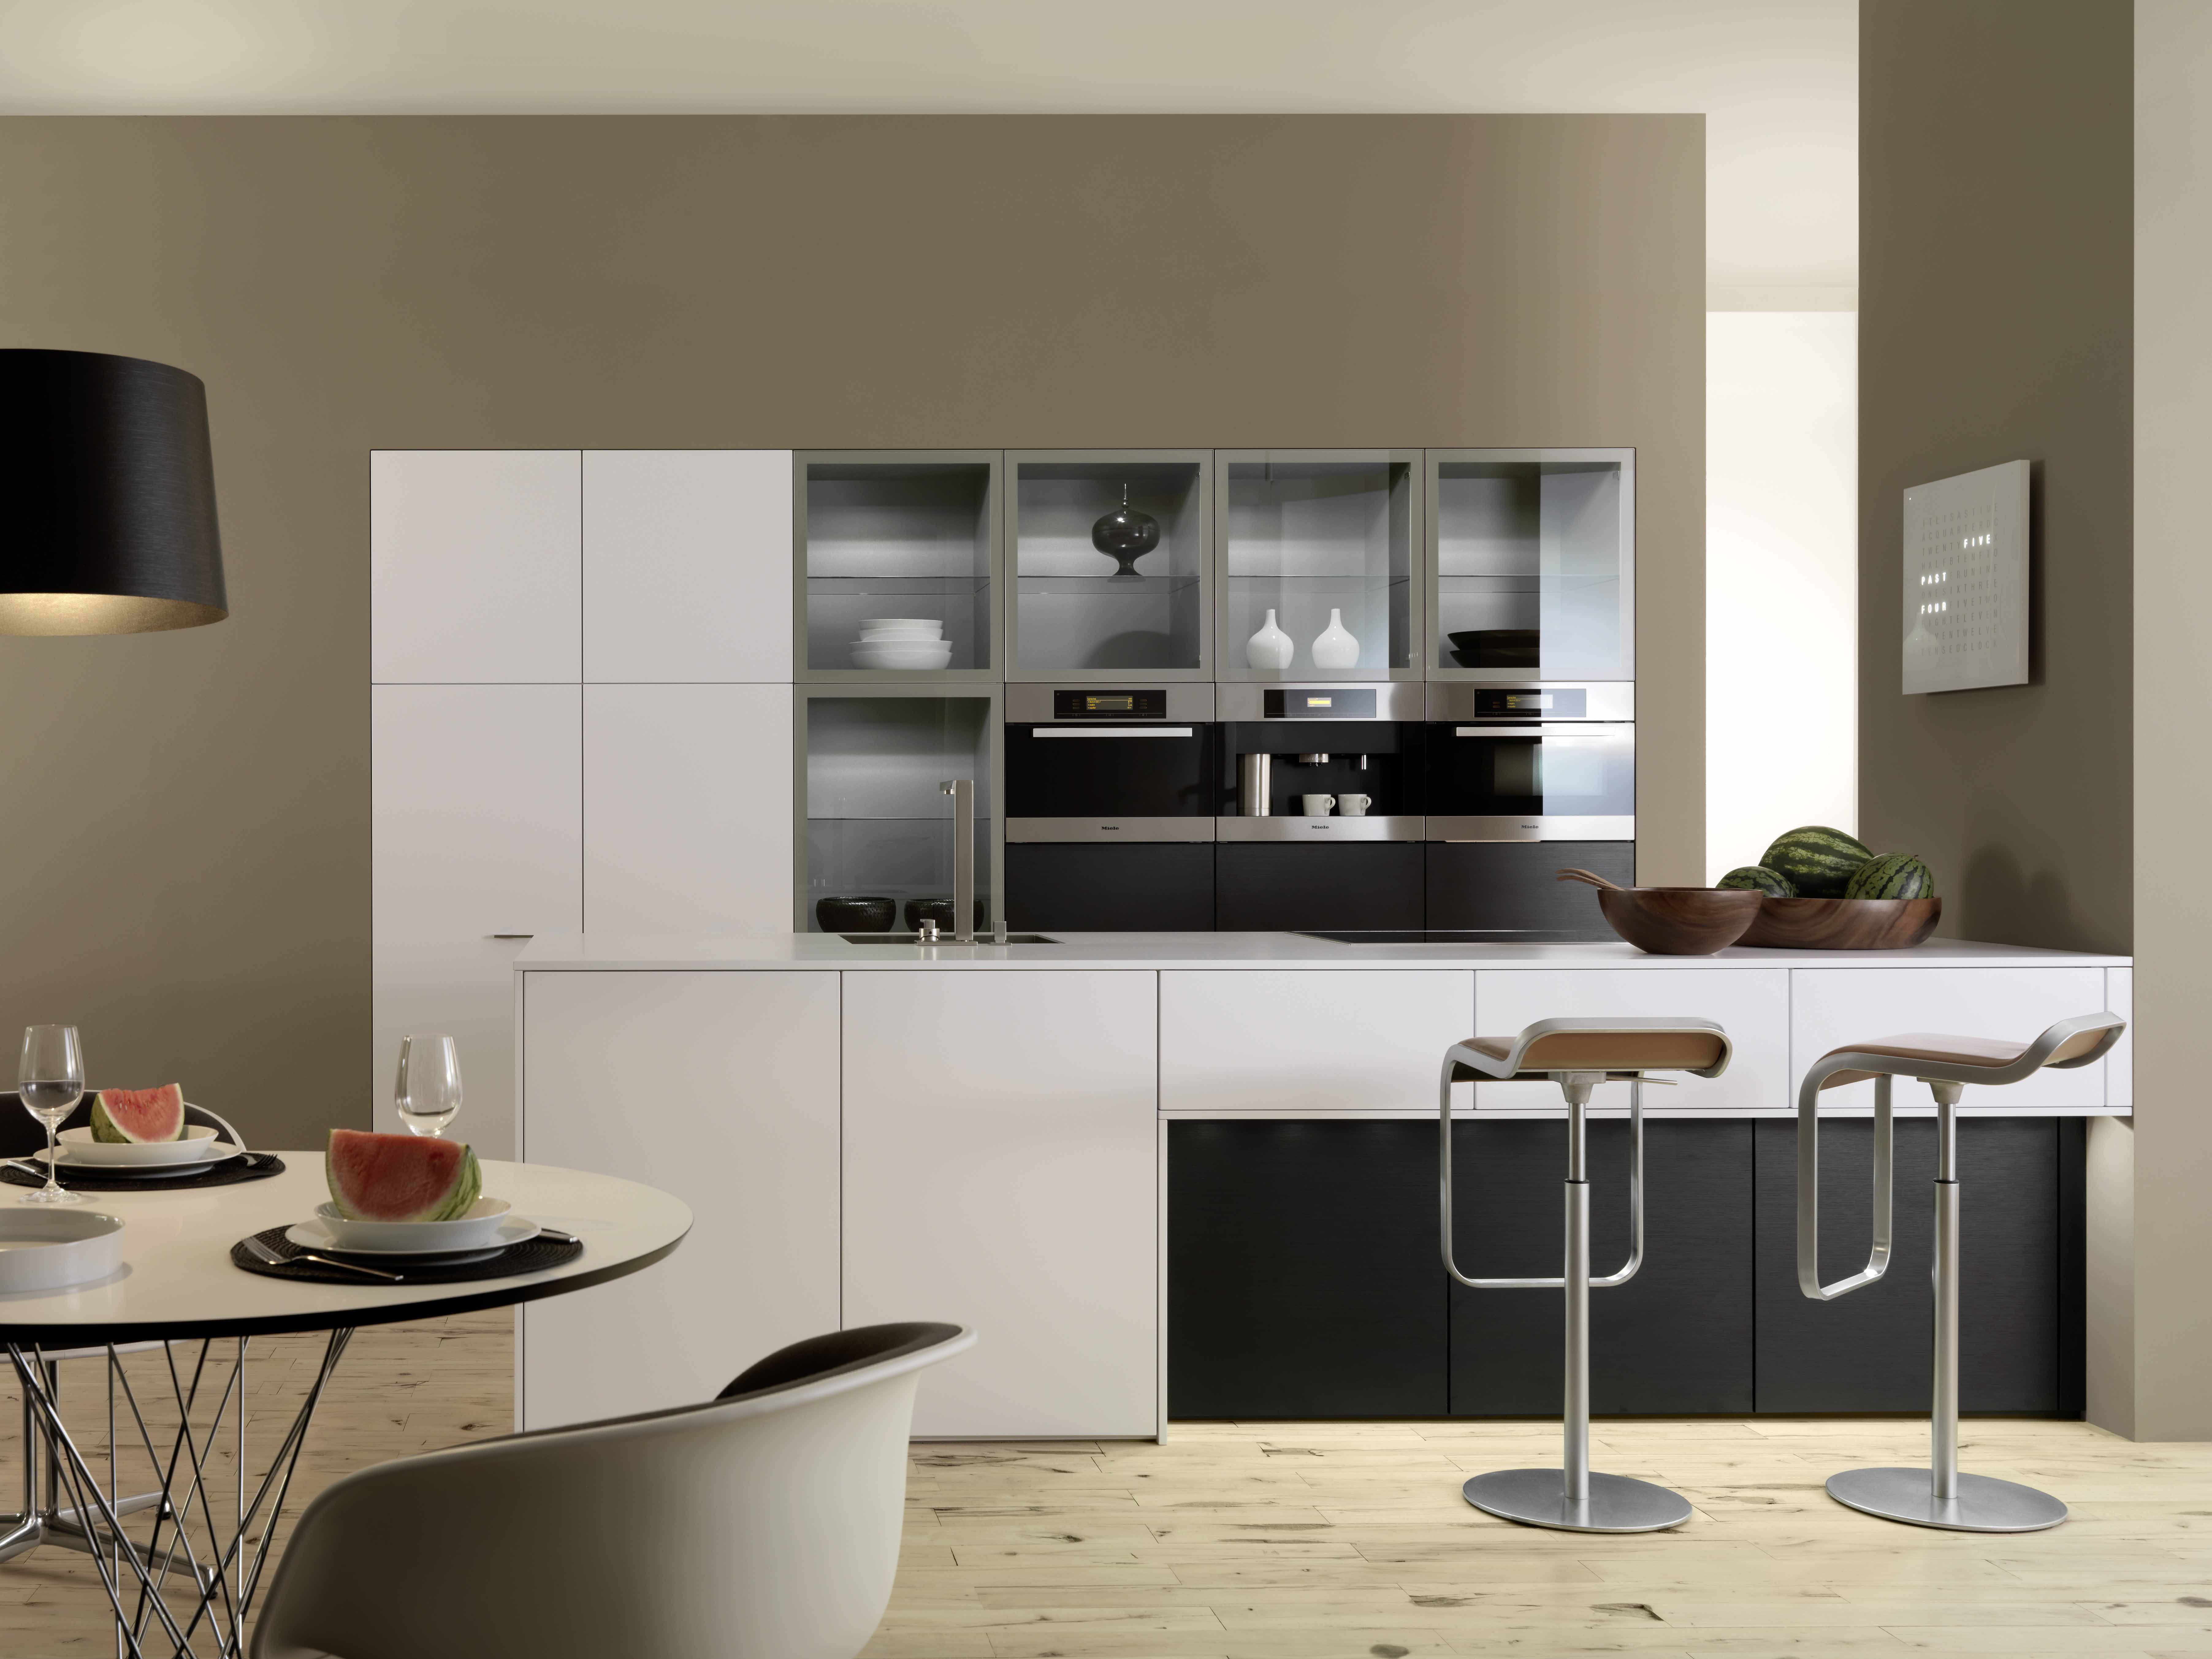 2 european kitchen cabinets 7 Design Tips for Best Architectural Acoustics